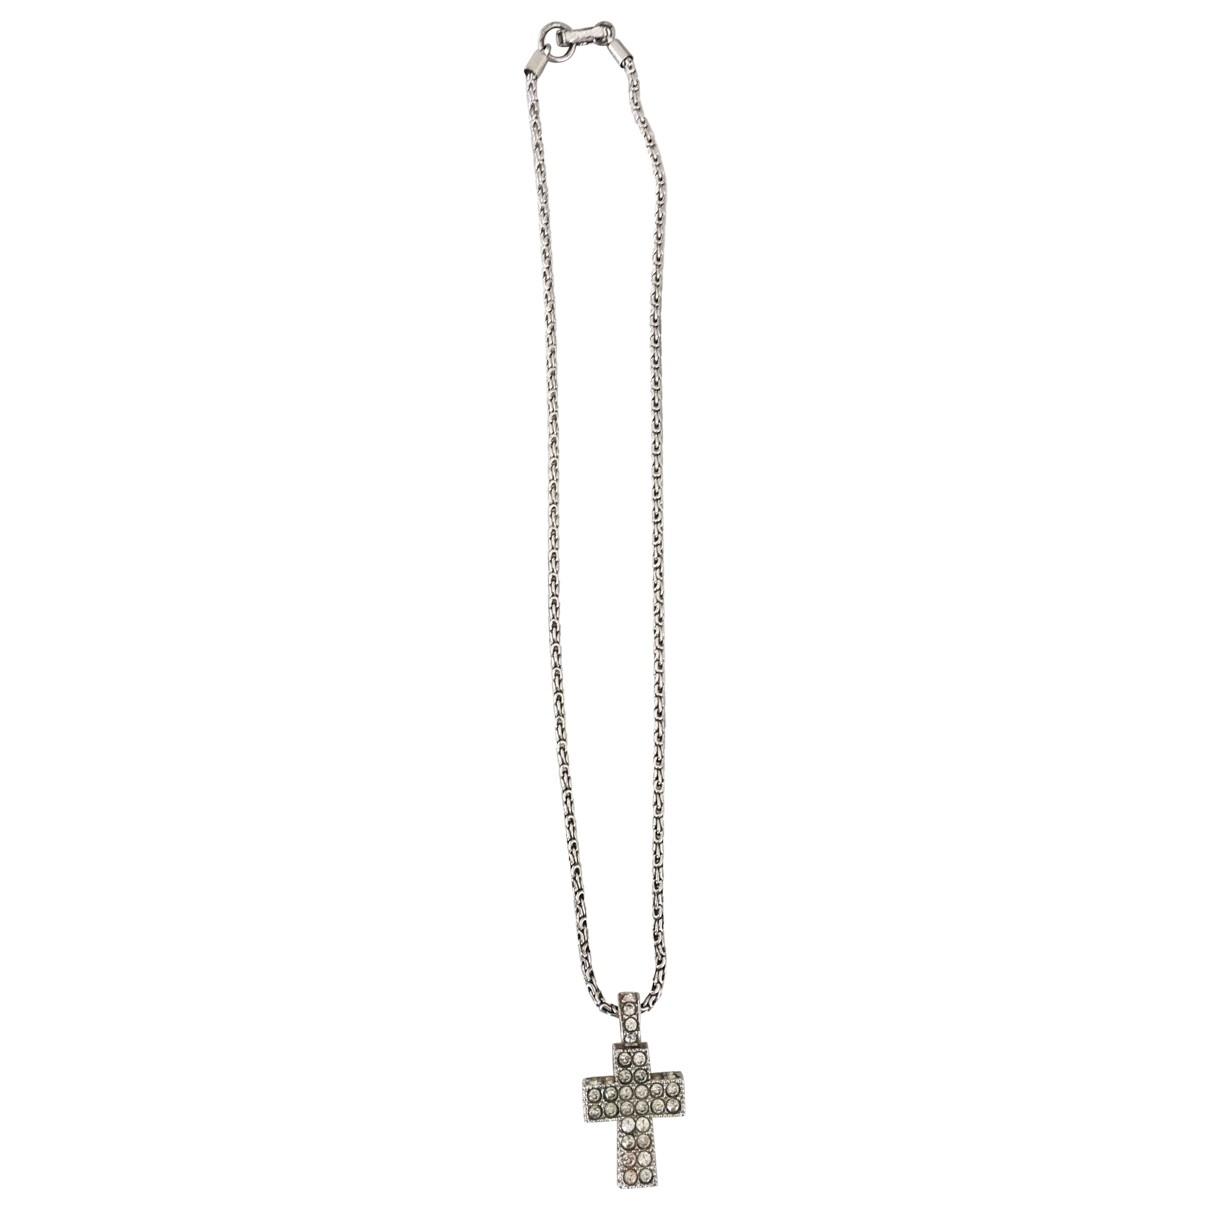 Swarovski \N Silver Metal necklace for Women \N